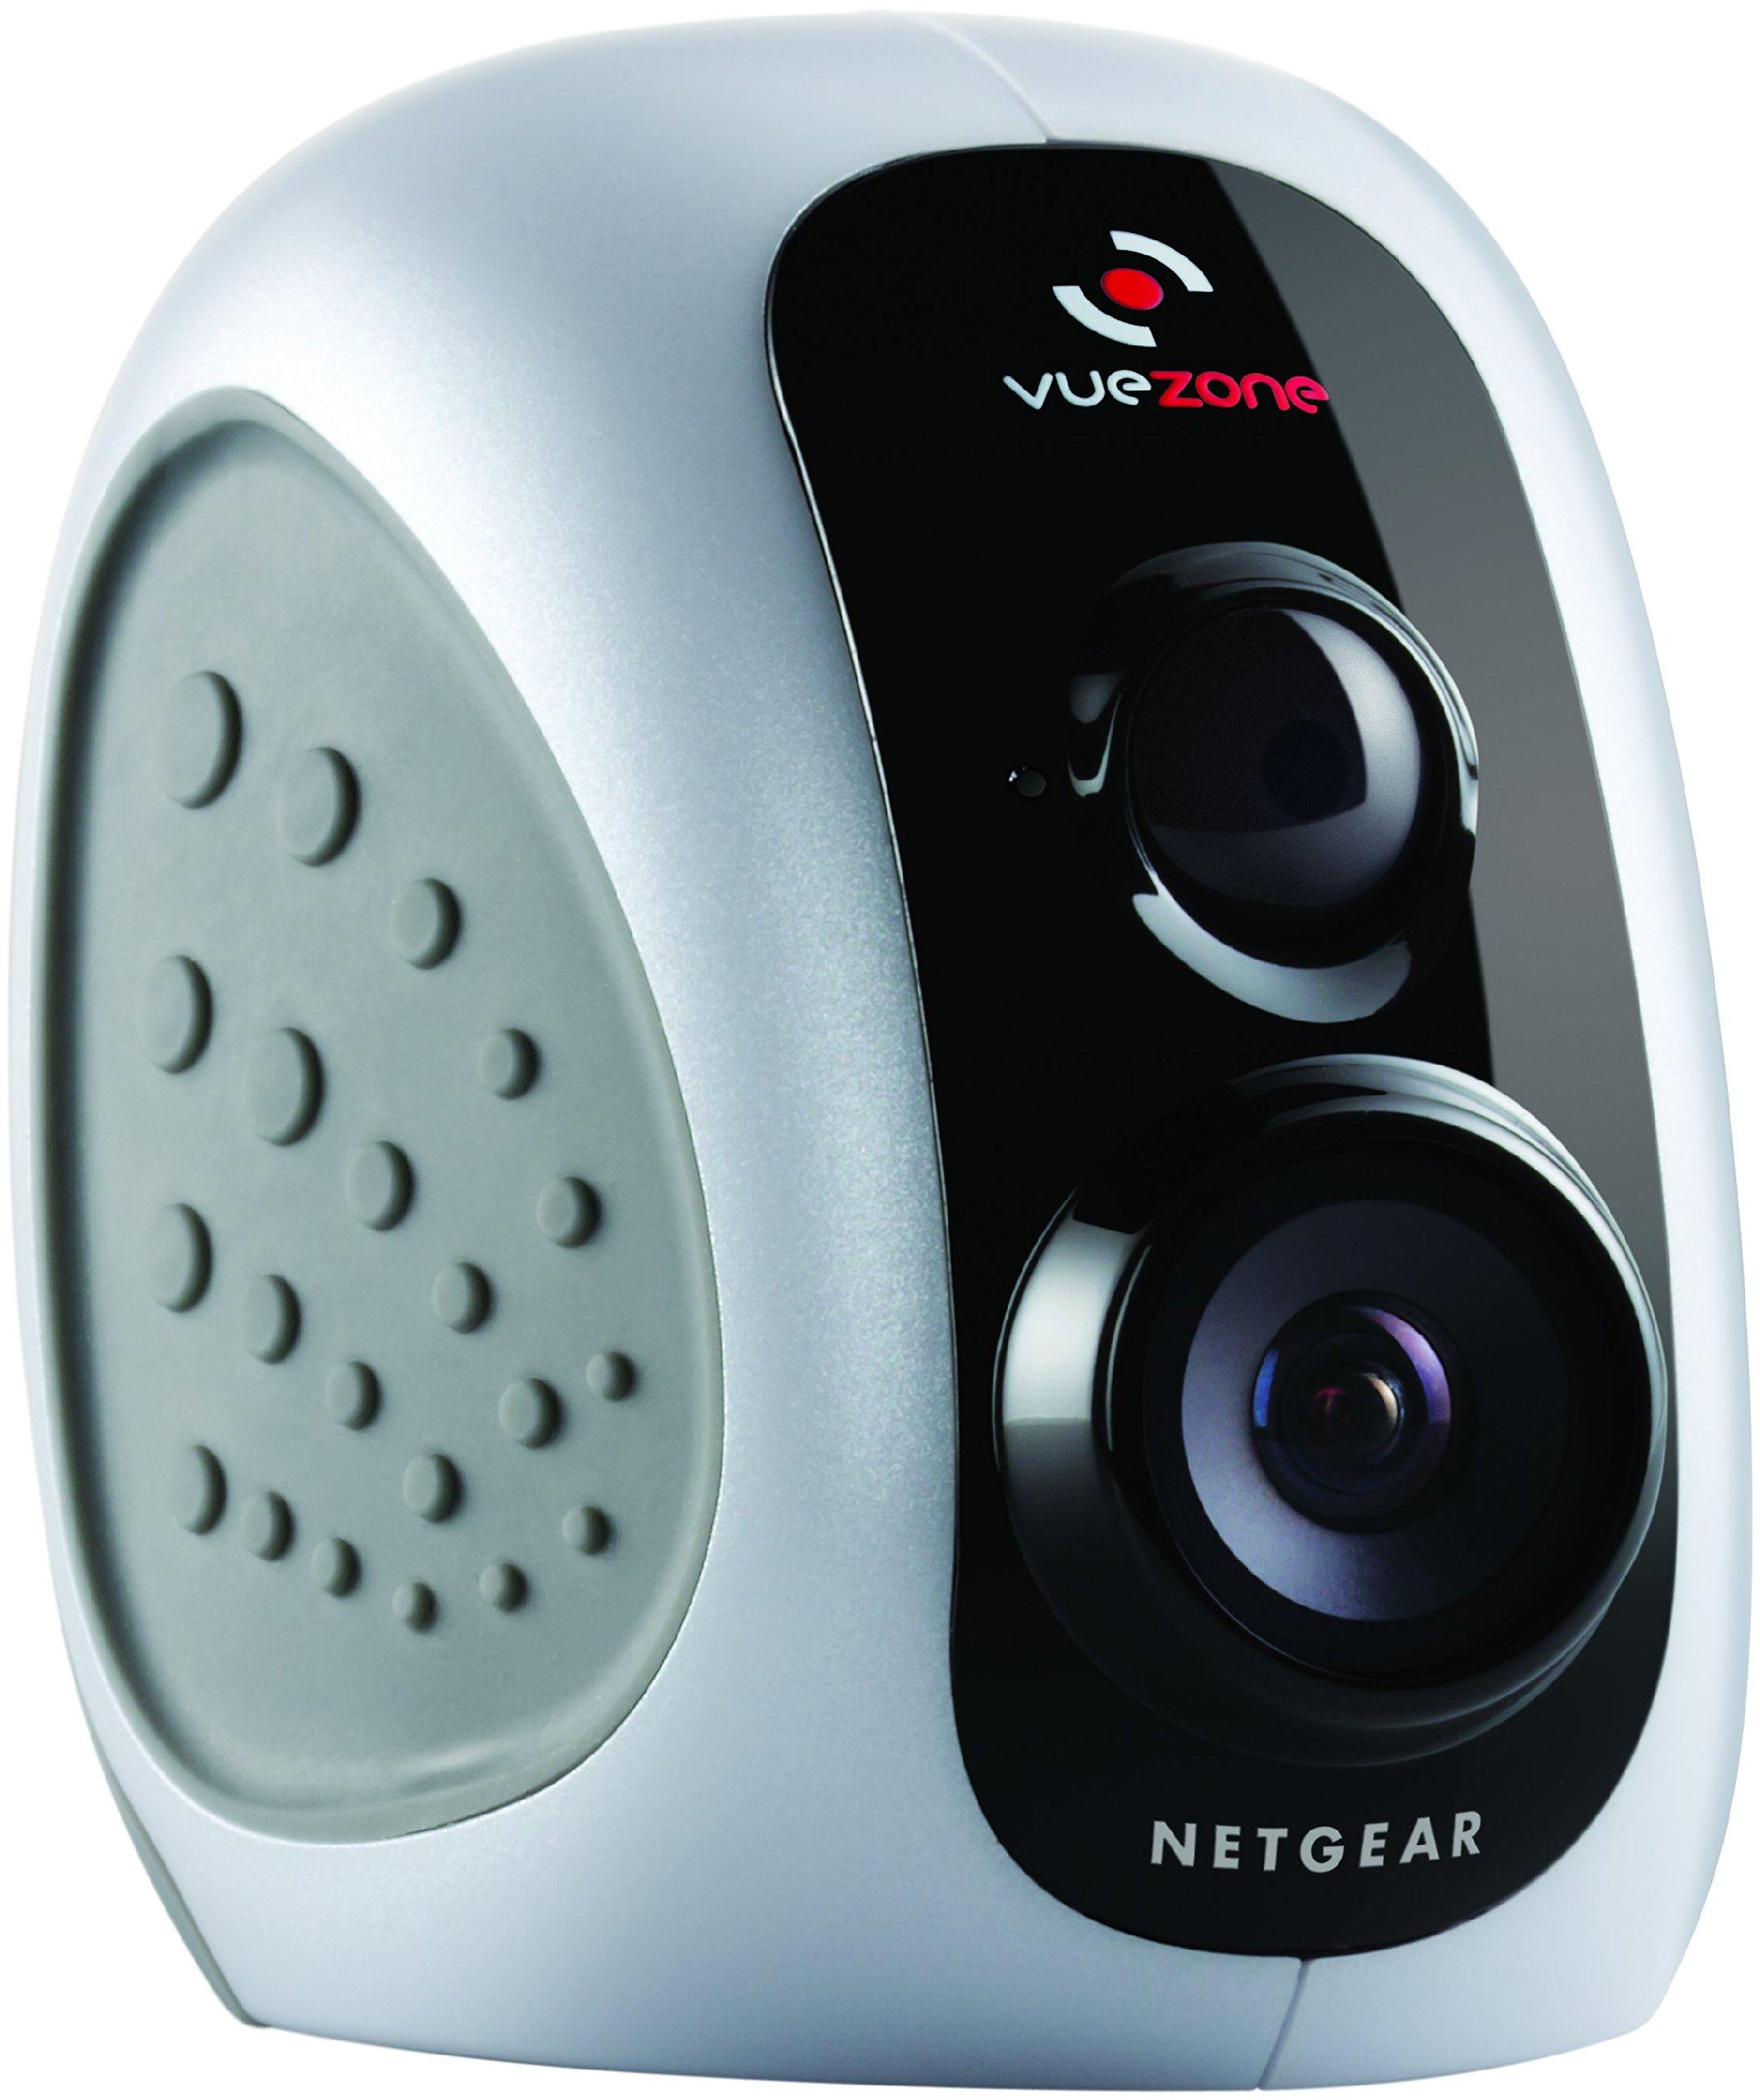 NETGEAR VueZone Add-on Motion Detection Camera (VZCM2050-200NAS)